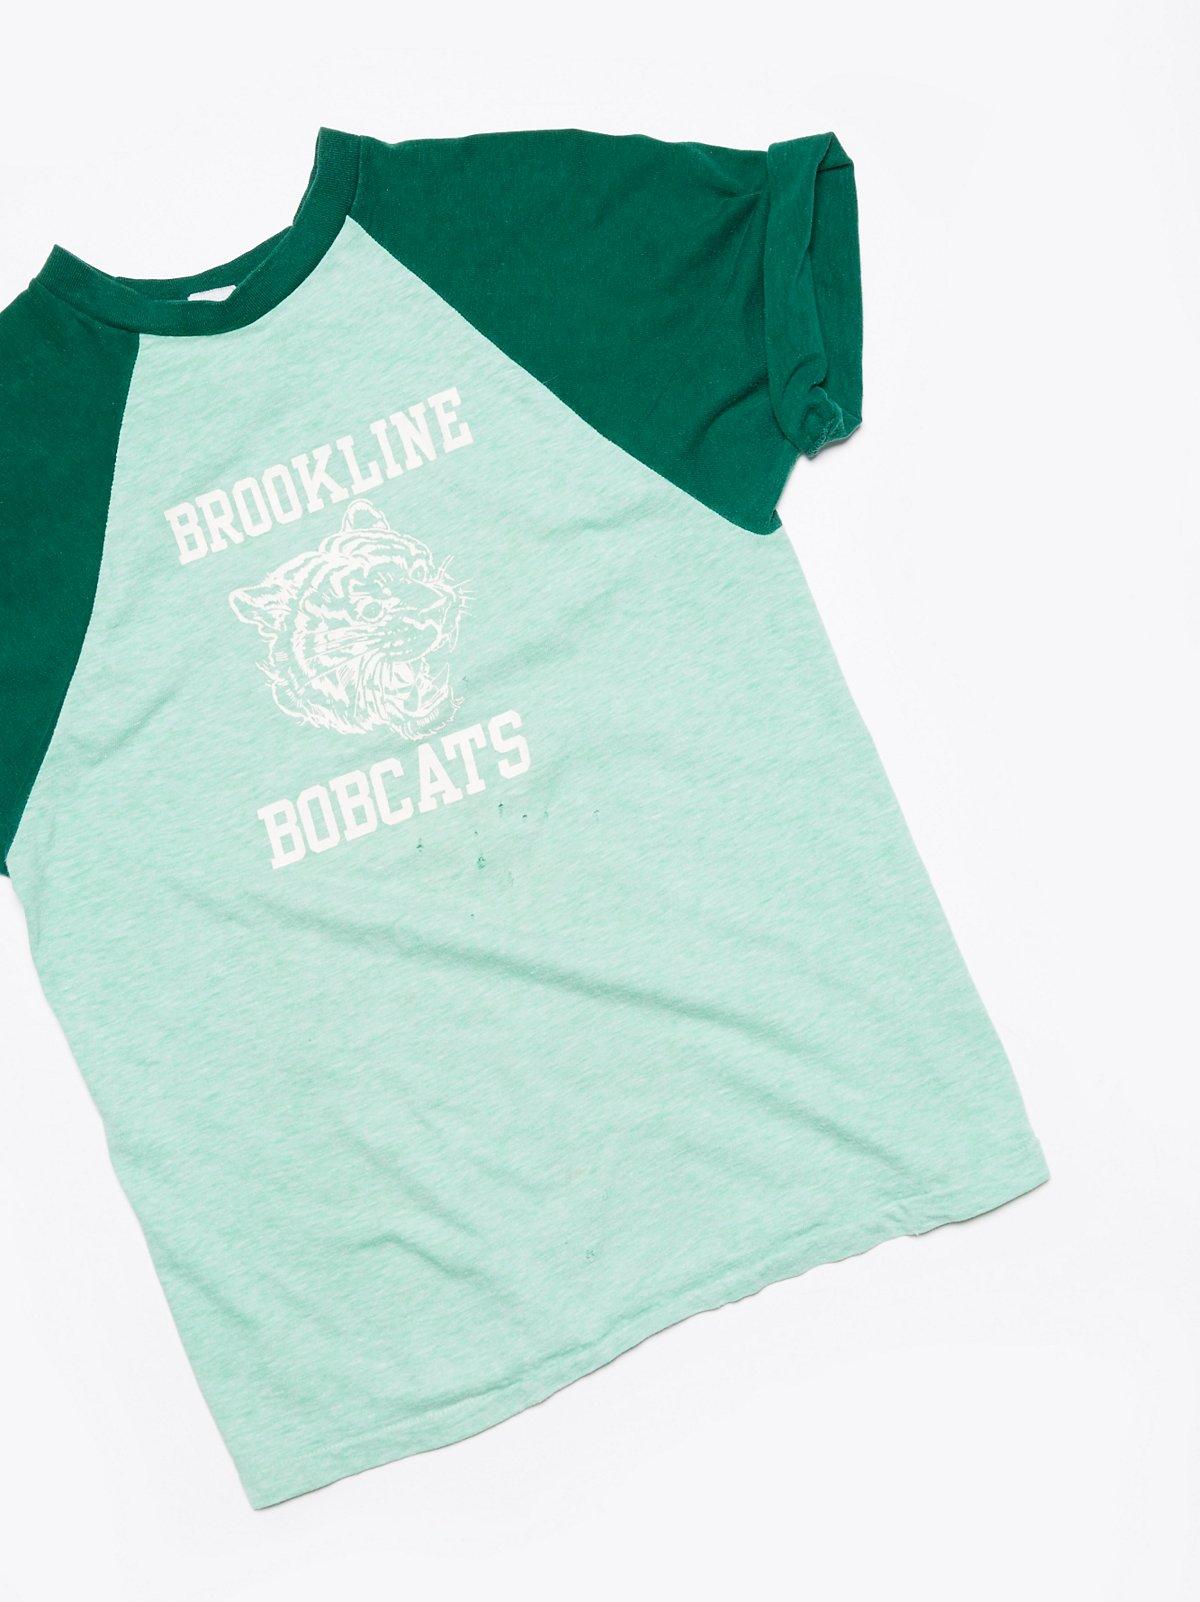 Vintage Brookline Bobcats Tee